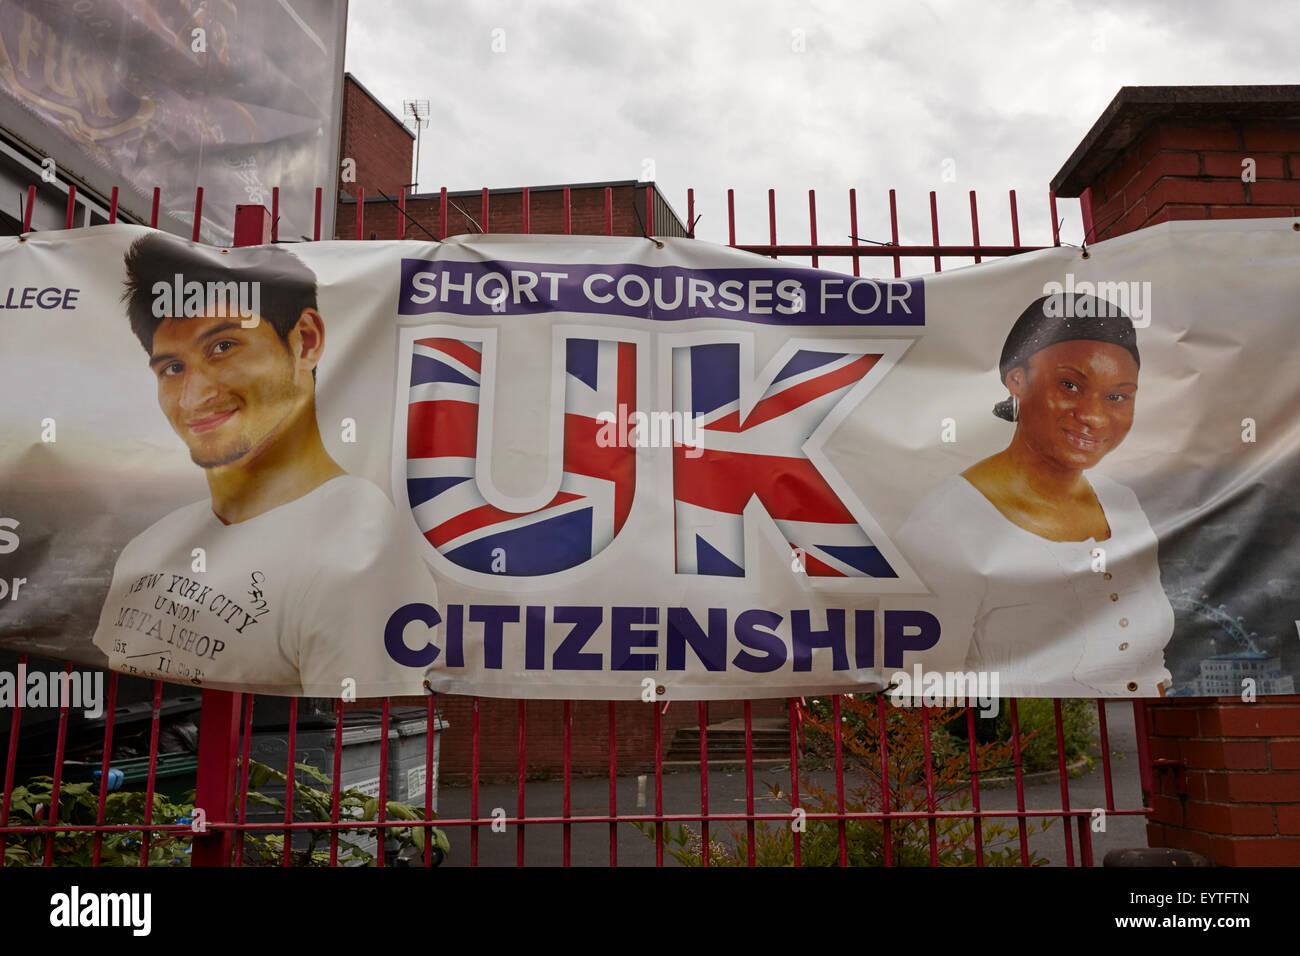 advert for short courses in uk citizenship in Birmingham UK - Stock Image